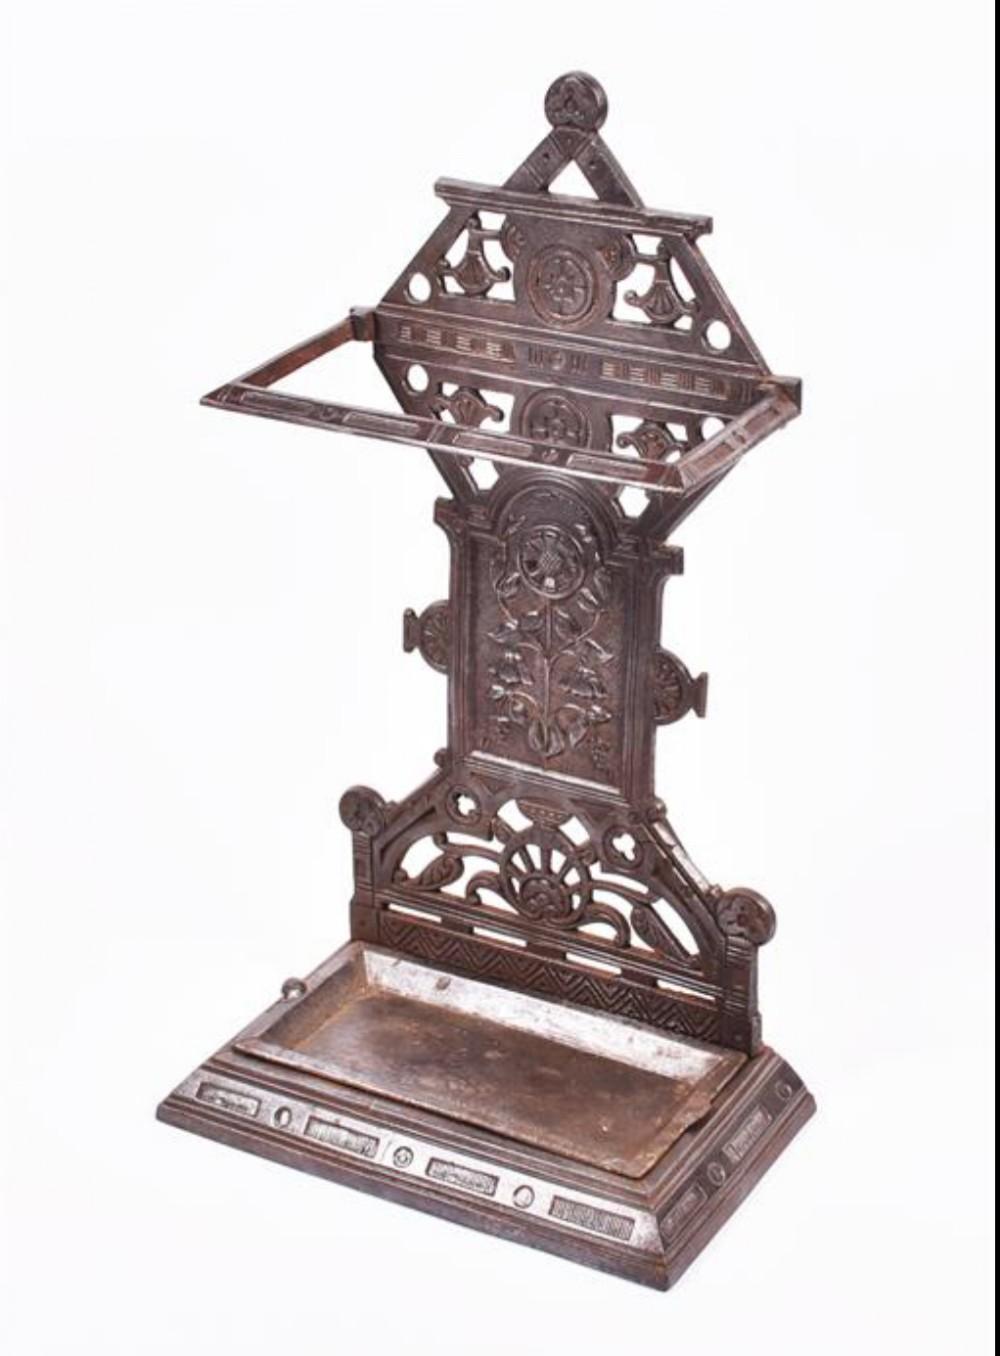 thomas jekyll 18271881 cast iron umbrella stand